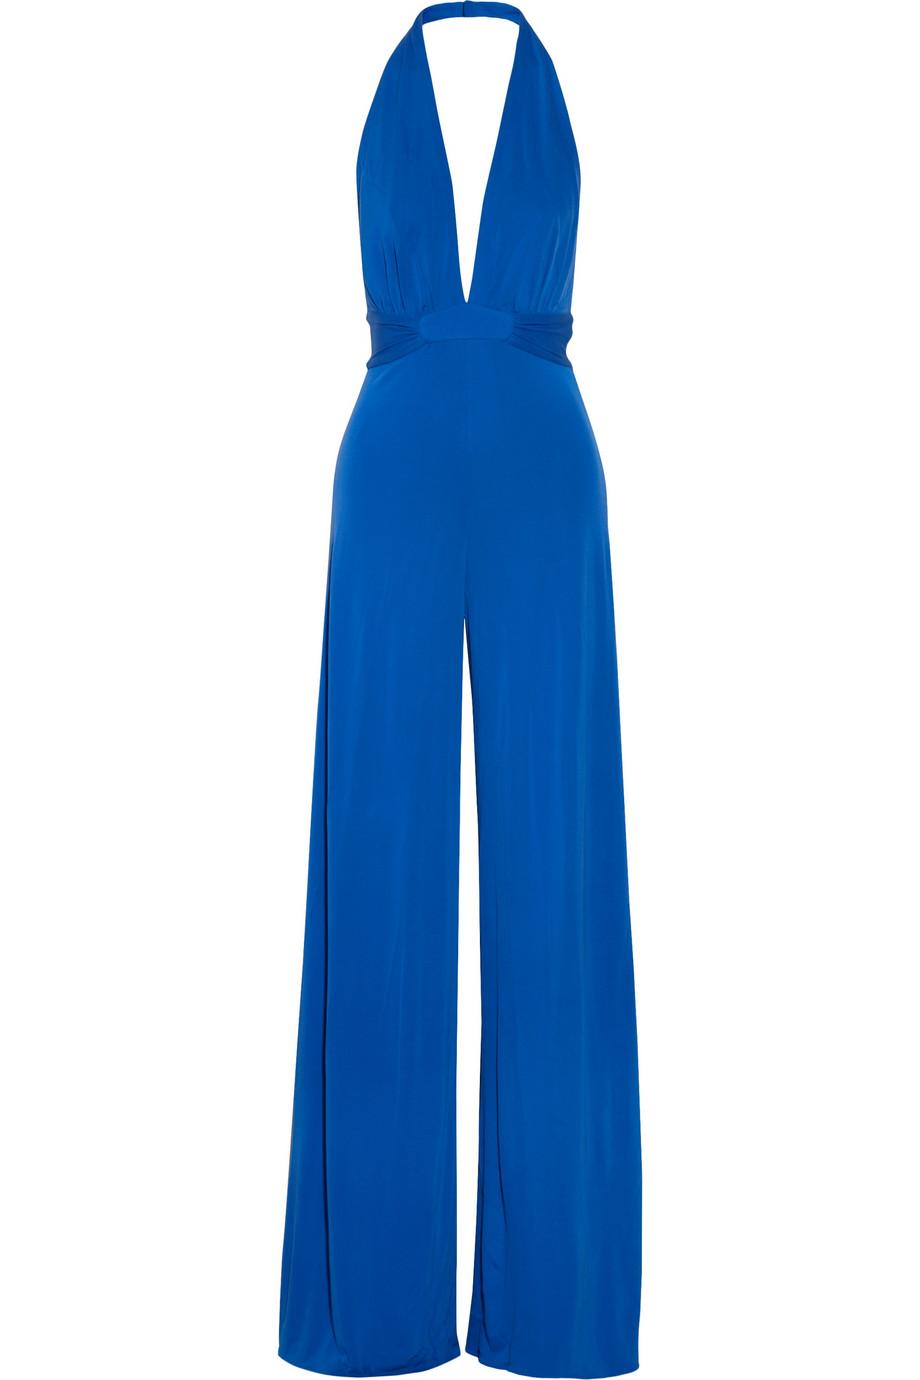 e9beac65110fd Lyst - Issa Silkcrepe Halterneck Jumpsuit in Blue